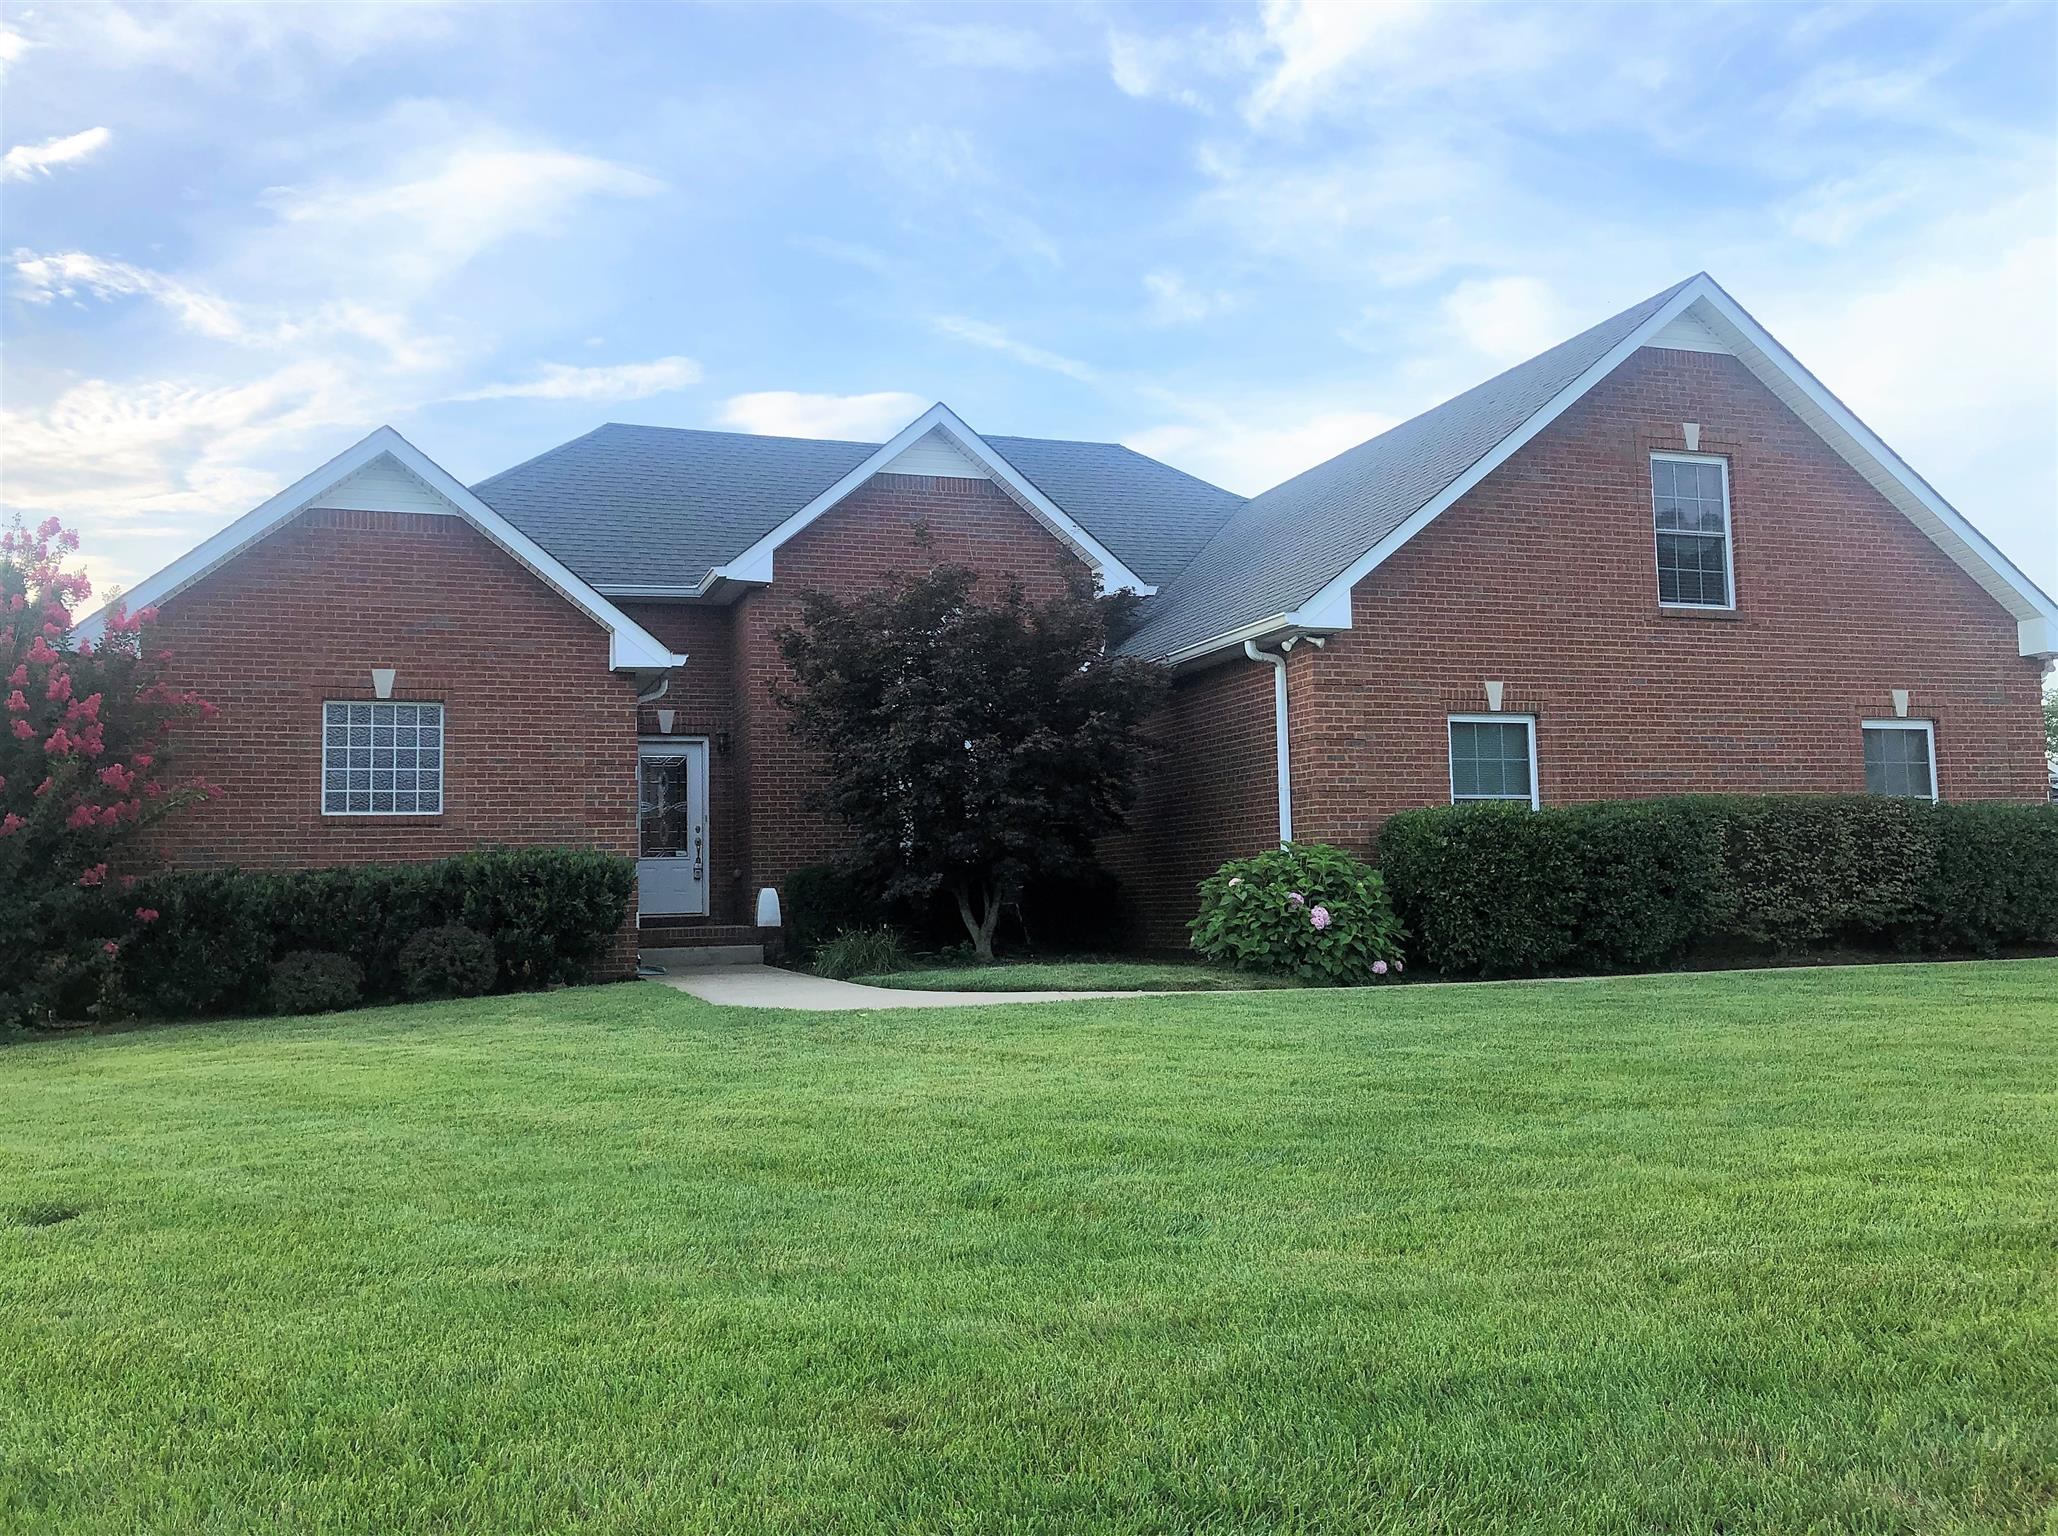 3231 Quincy Lane, Clarksville, TN 37043 - Clarksville, TN real estate listing